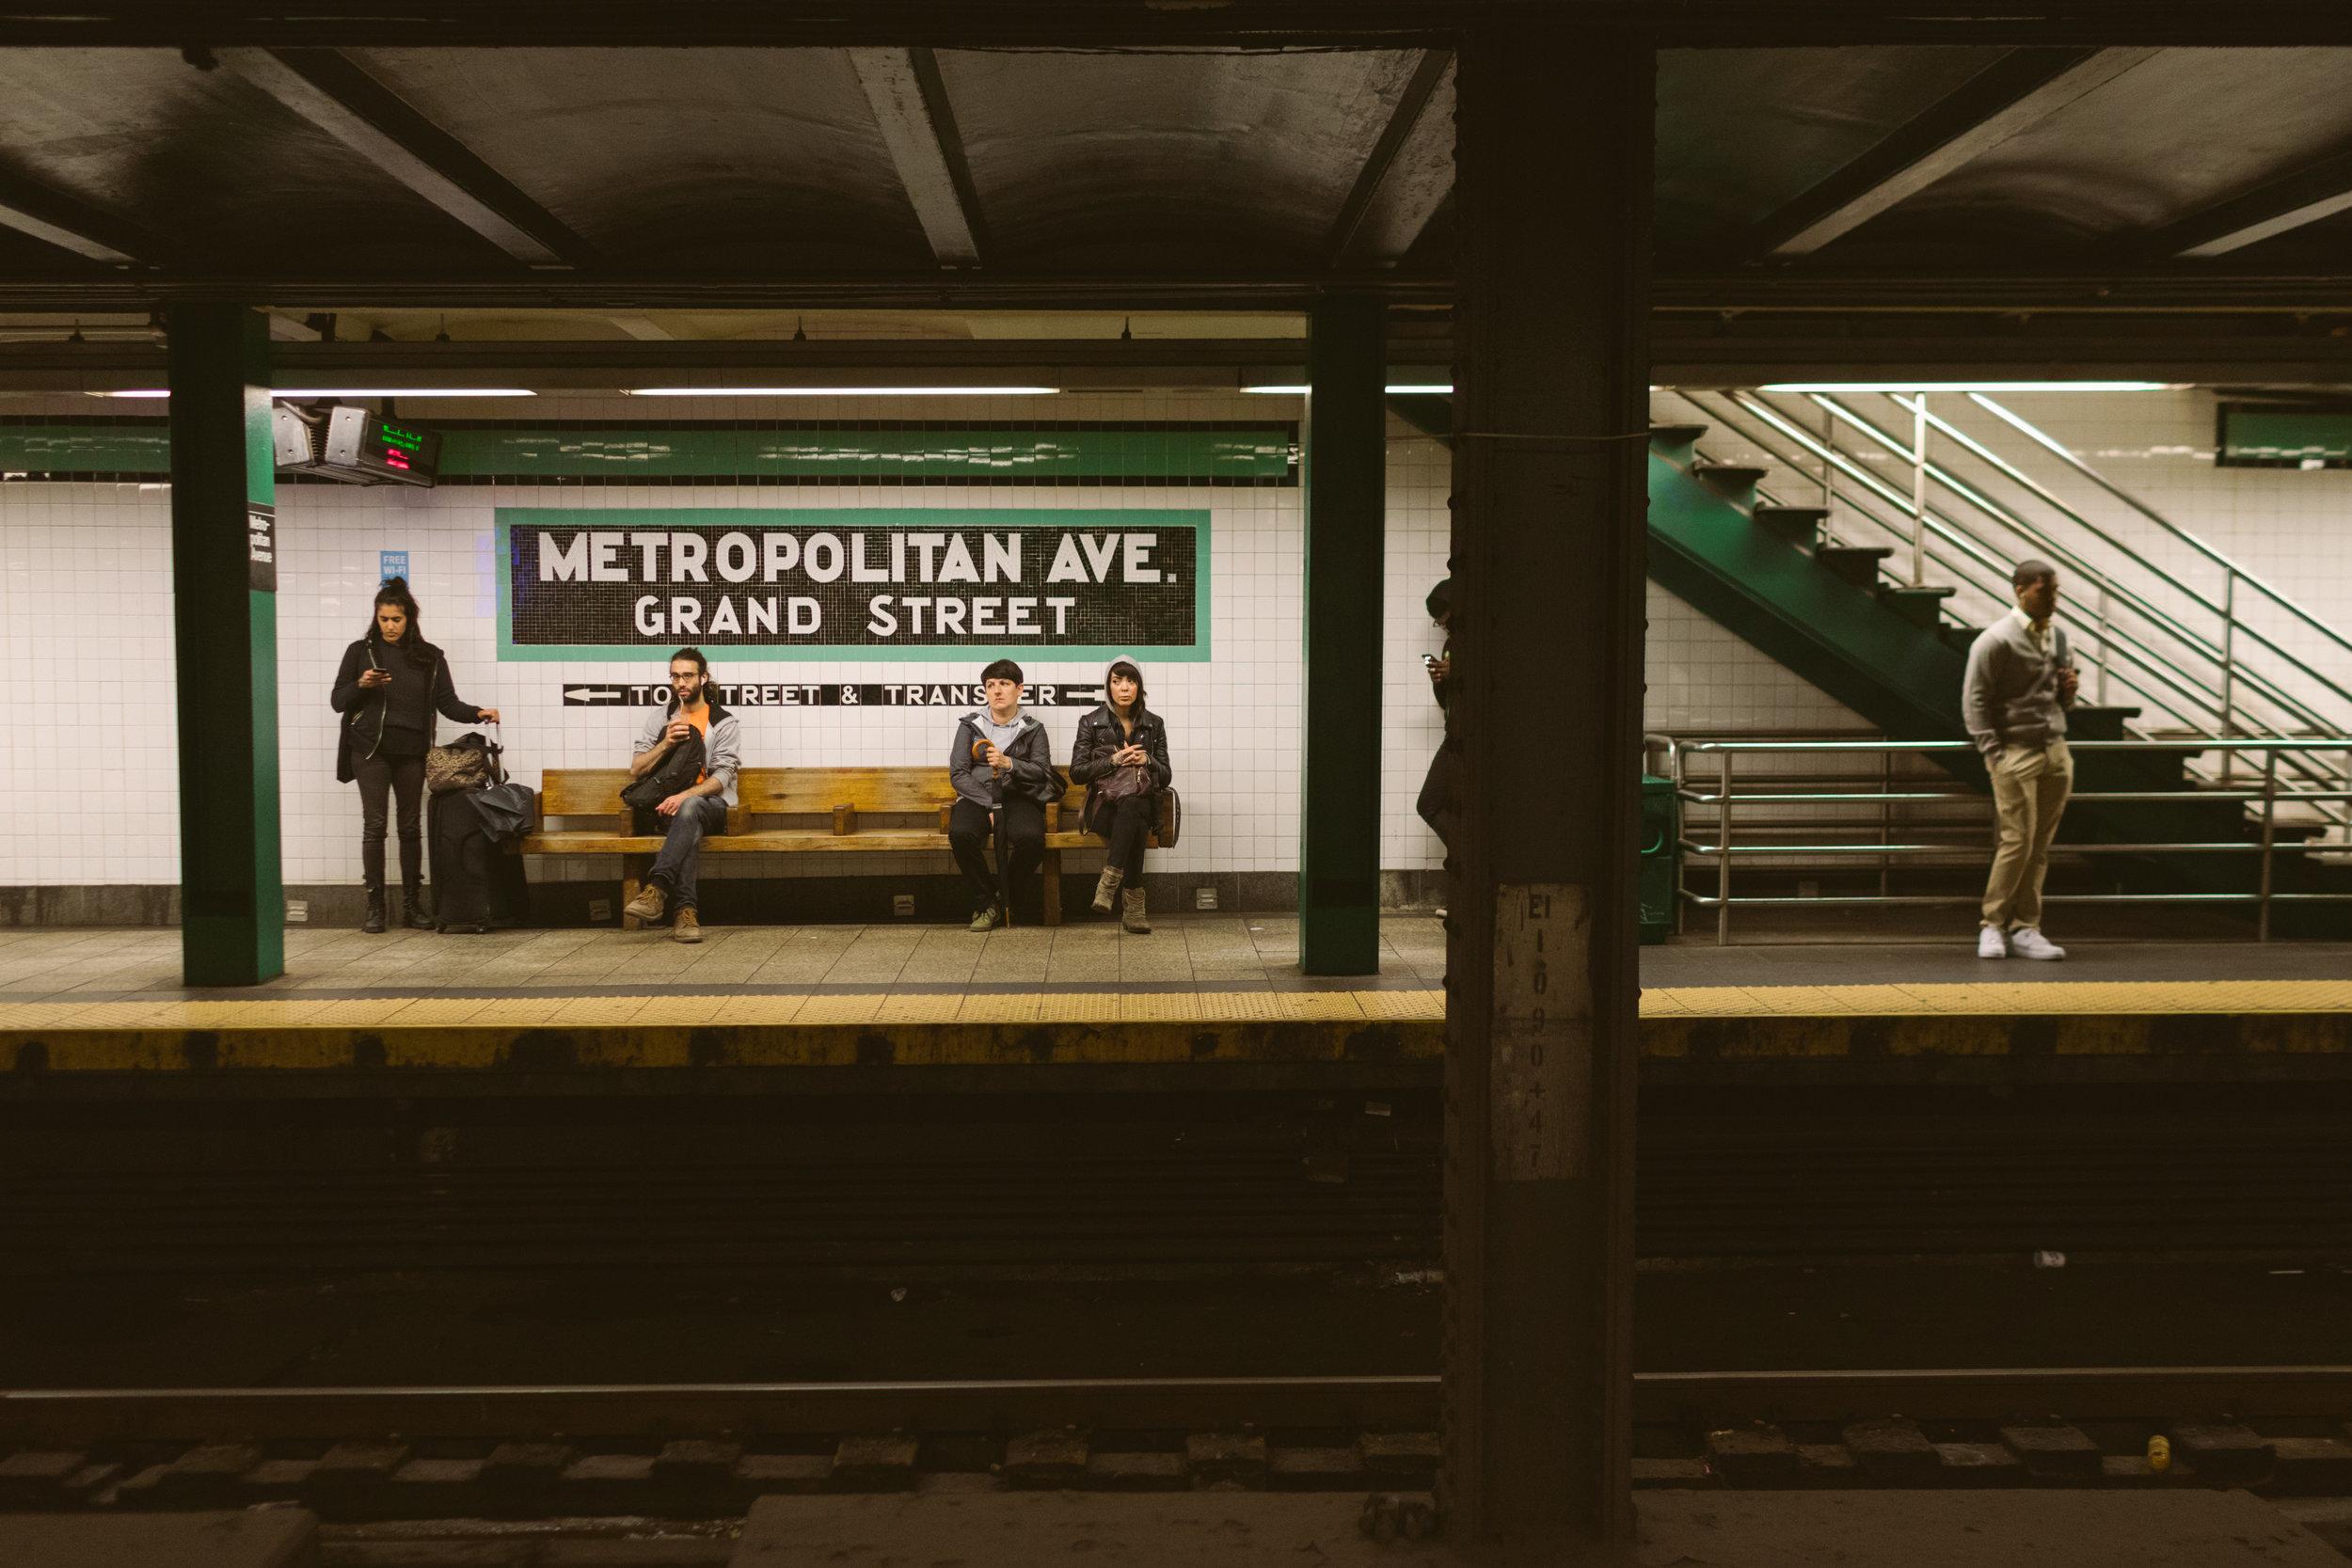 1023.shewanders.loves.new.york.art.museums.jpg